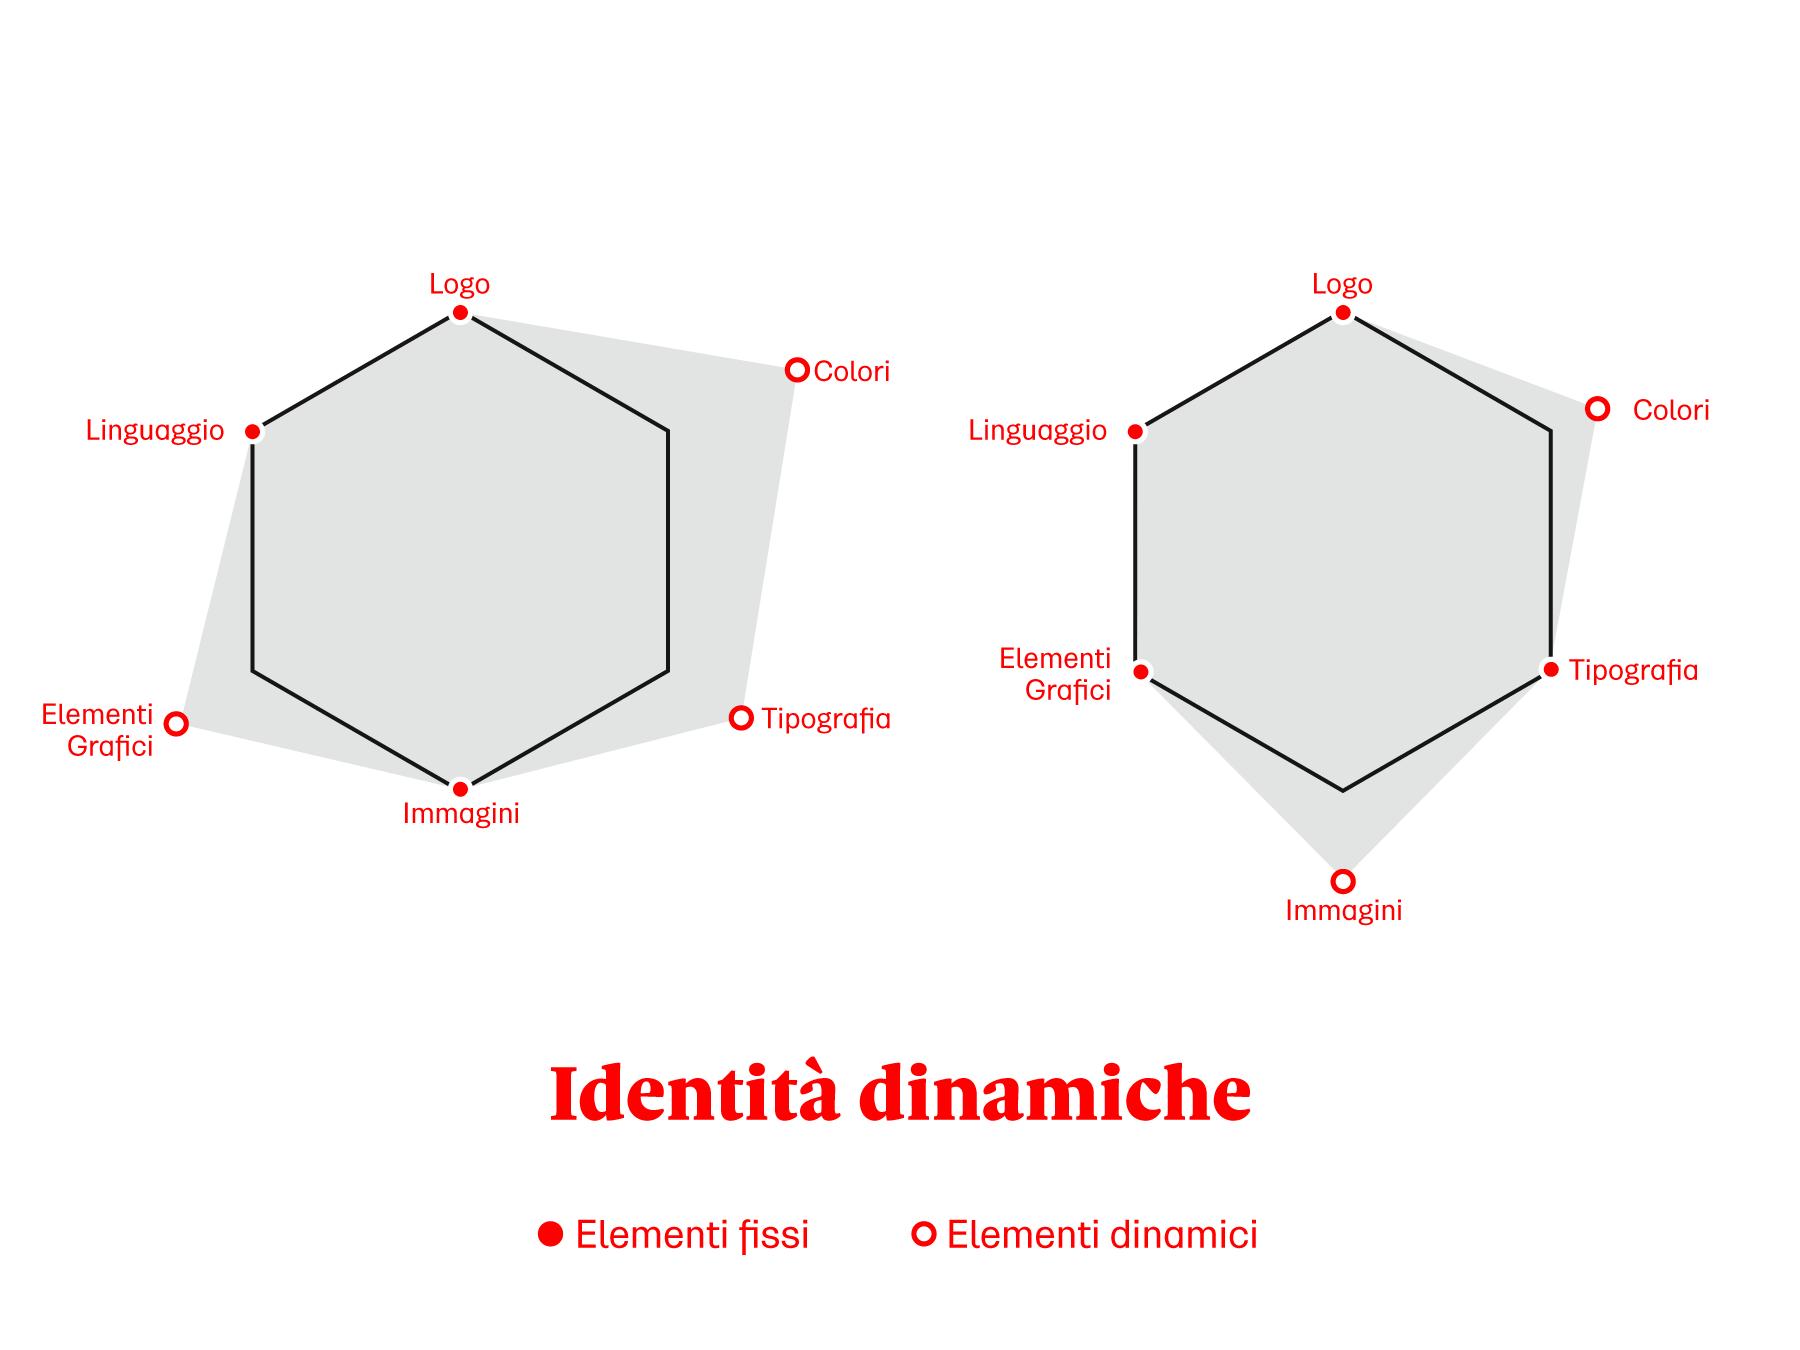 Possibili variazioni di una identità dinamica: elementi fissi ed elementi variabili.